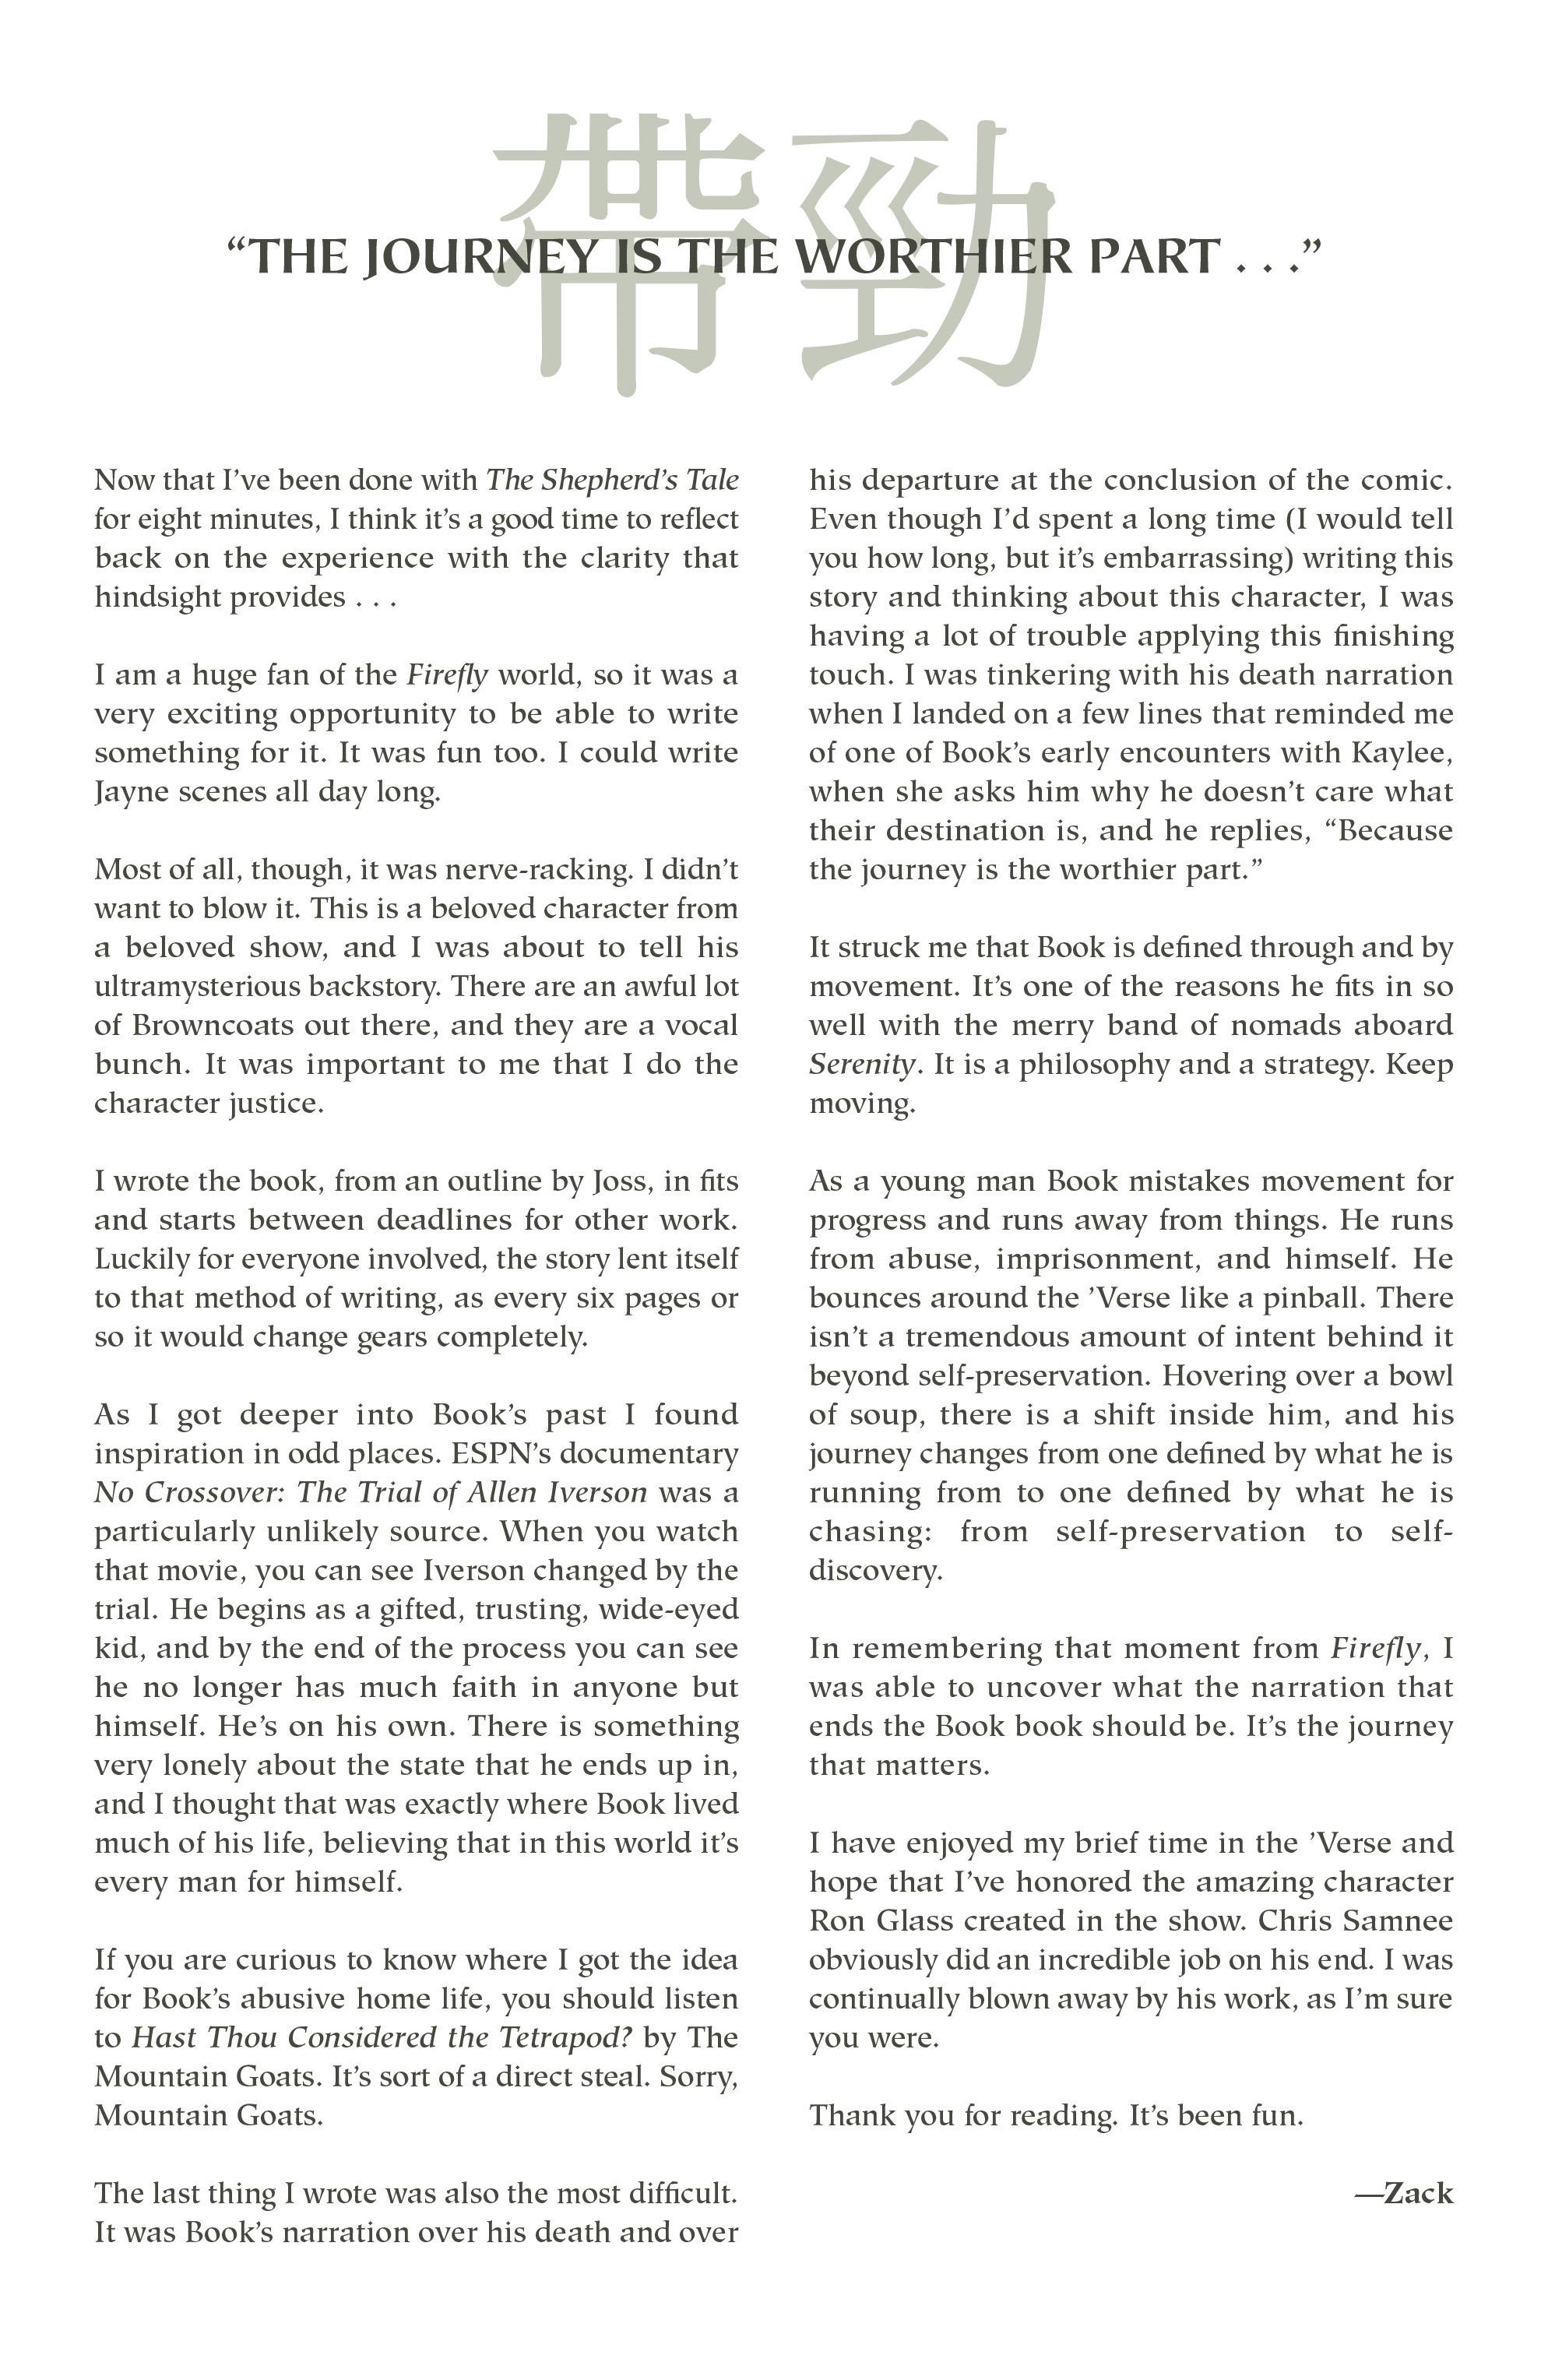 Read online Serenity Volume Three: The Shepherd's Tale comic -  Issue # TPB - 57